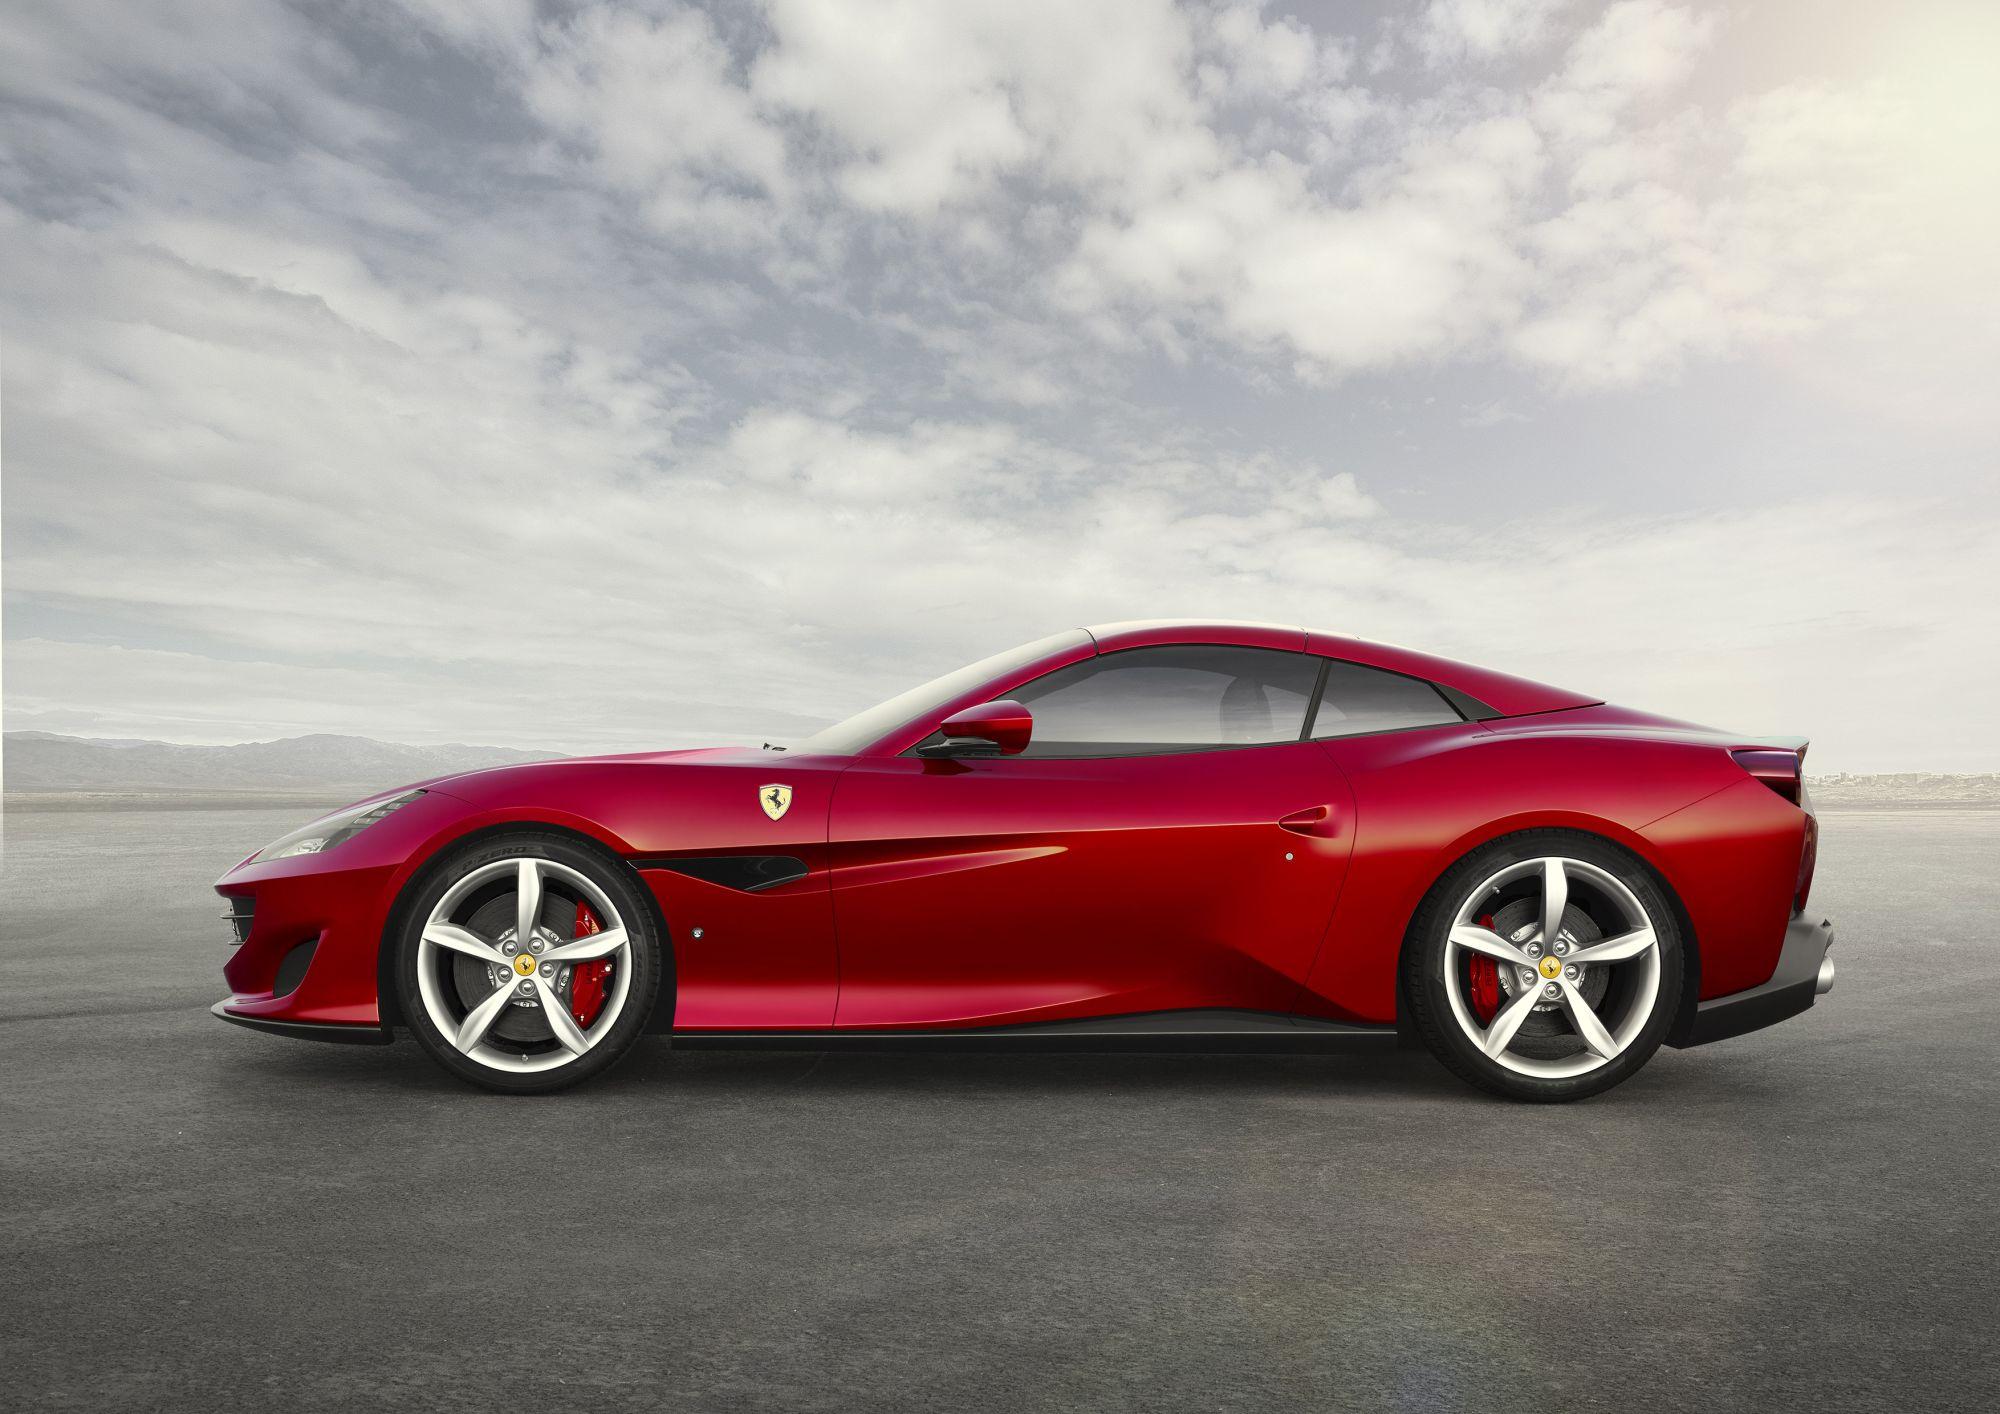 Ferrari Unveils The Portofino An All New Drop Top Singapore Tatler